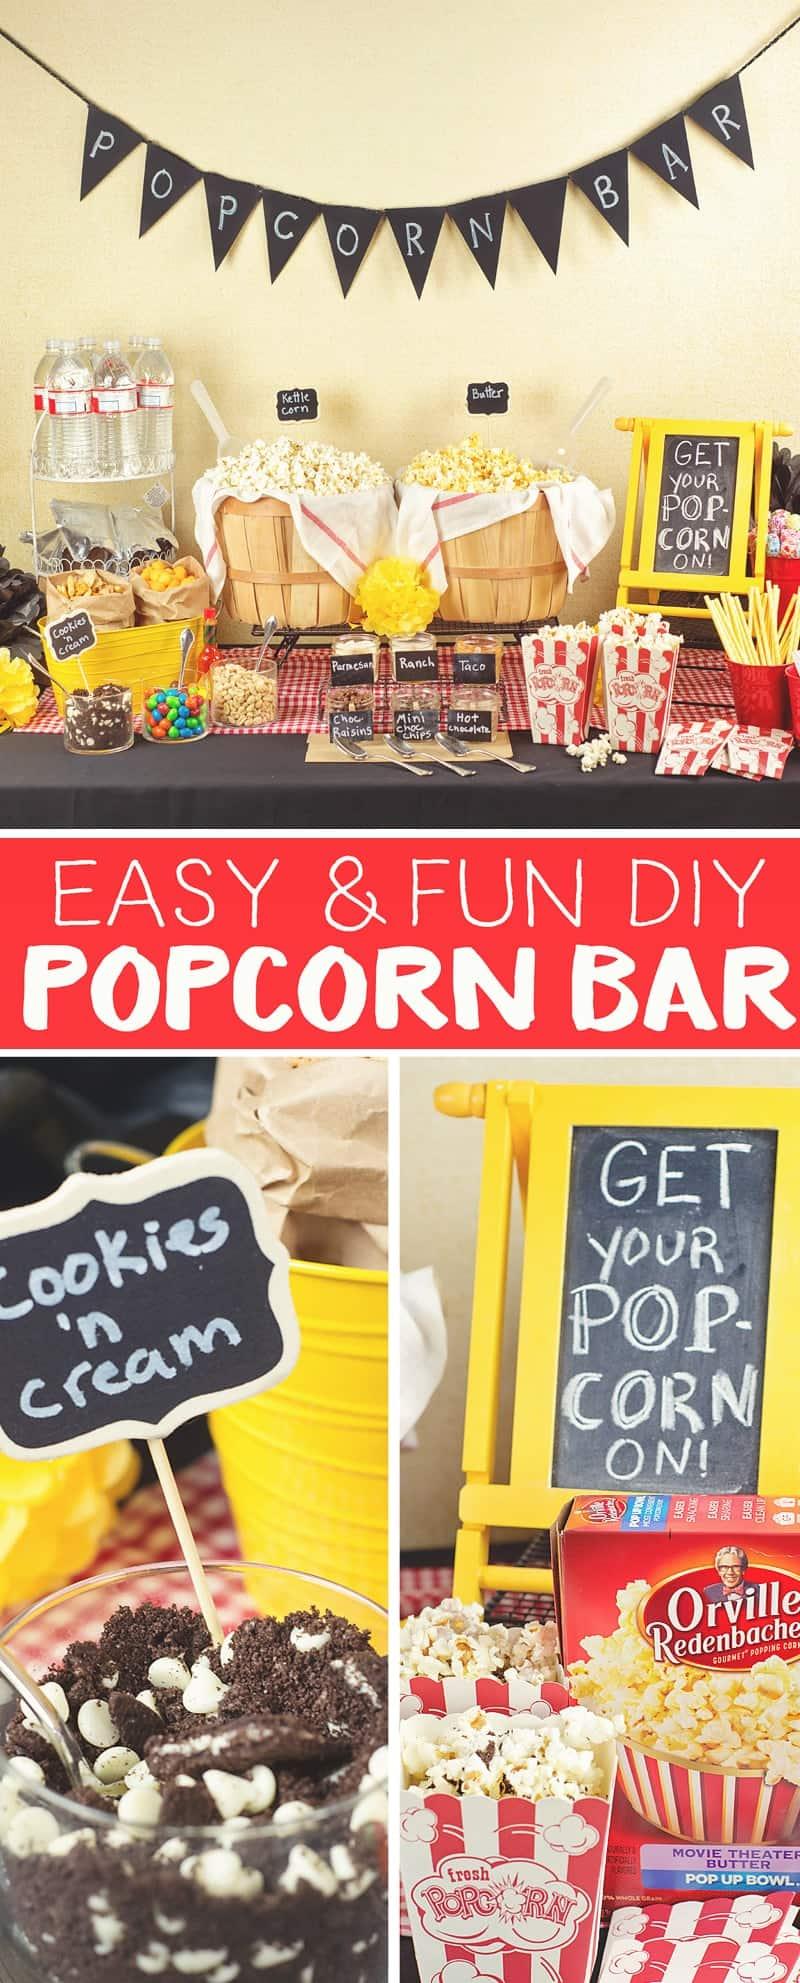 DIY Popcorn Bars are